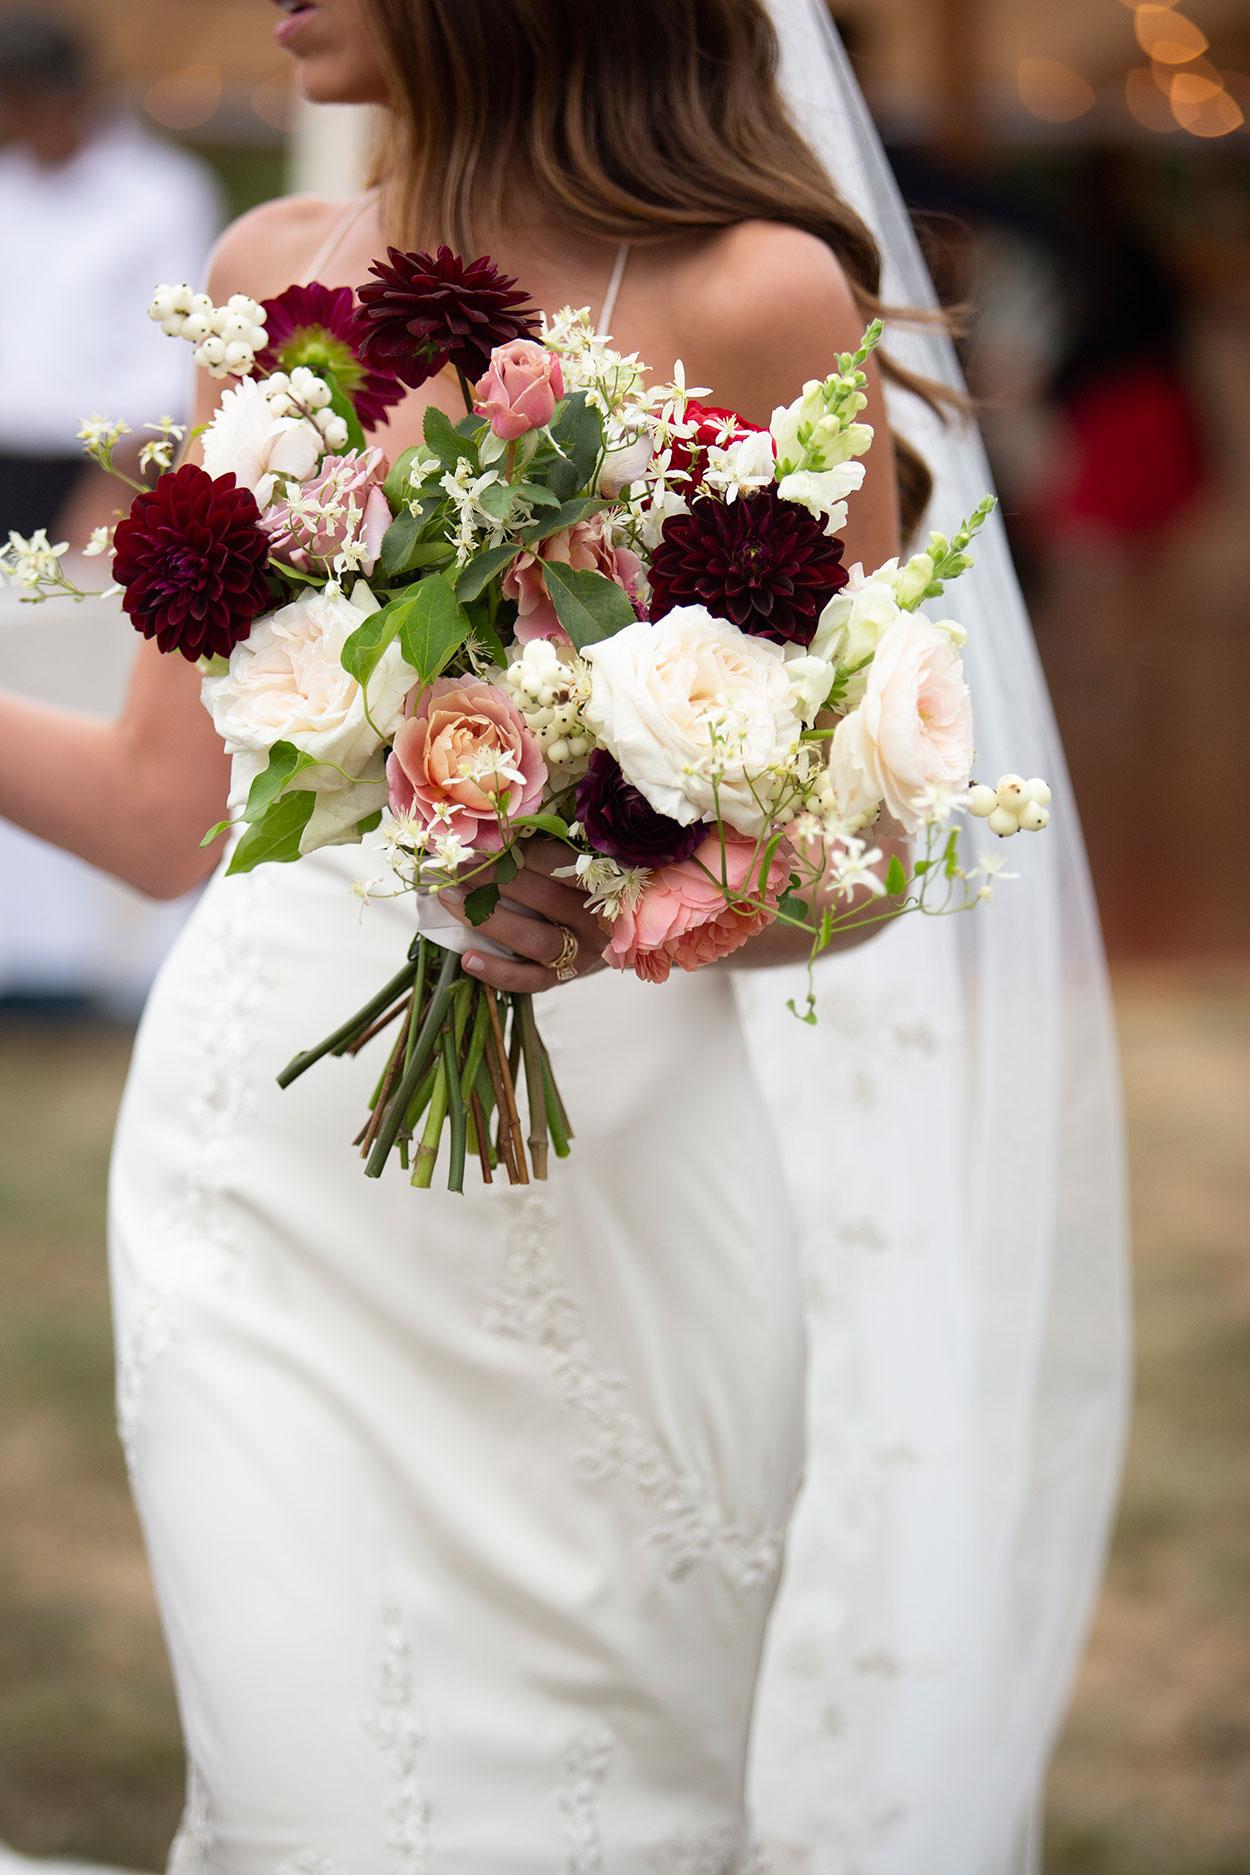 MARTHA'S VINEYARD WEDDING by Boston based designer mStarr design